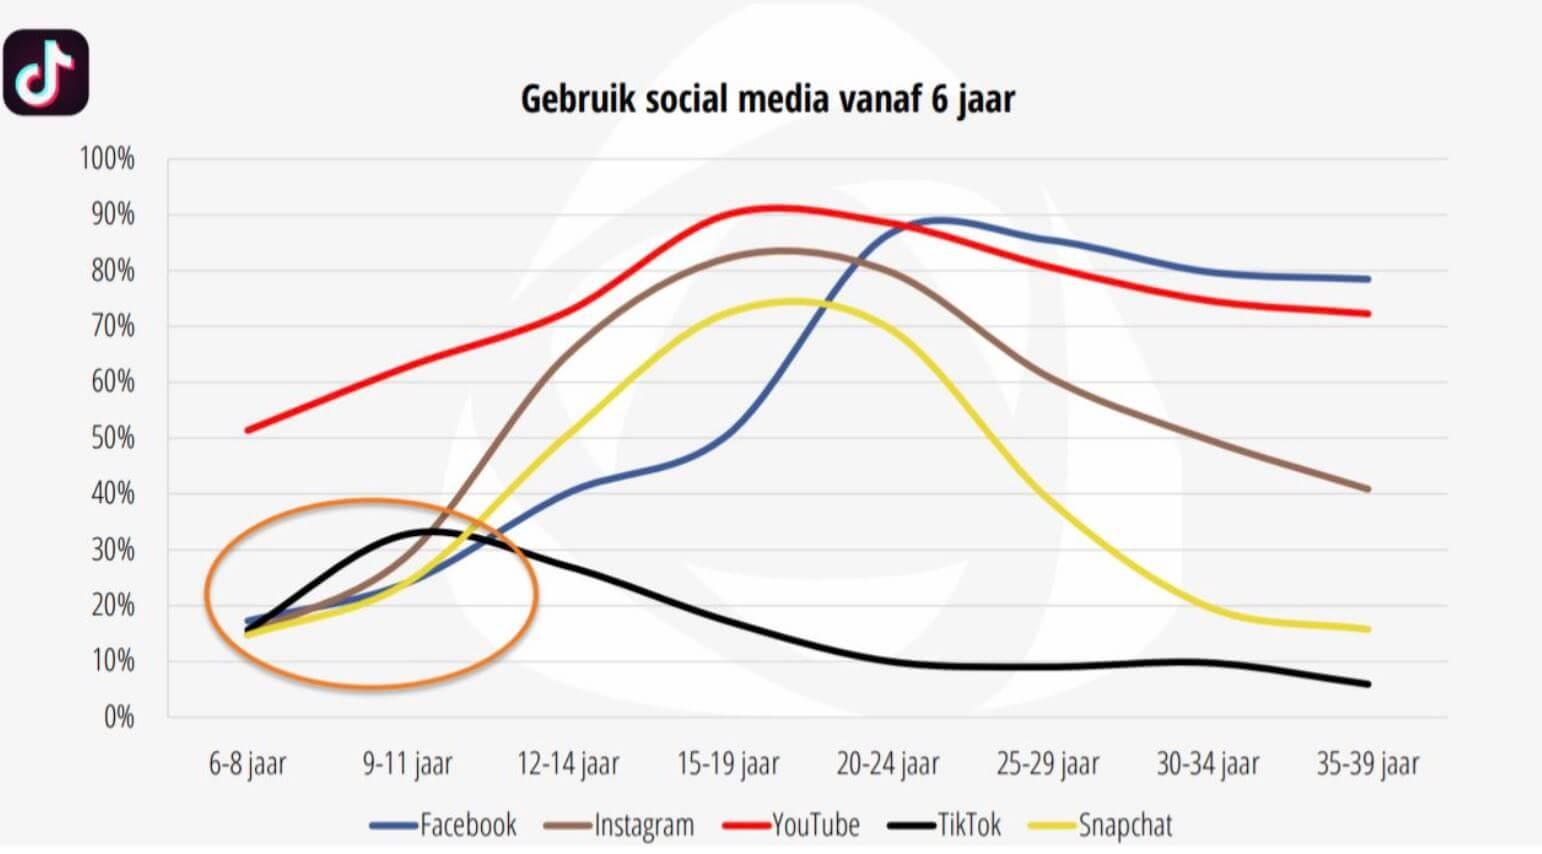 Gebruik Social Media per leeftijdsgroep